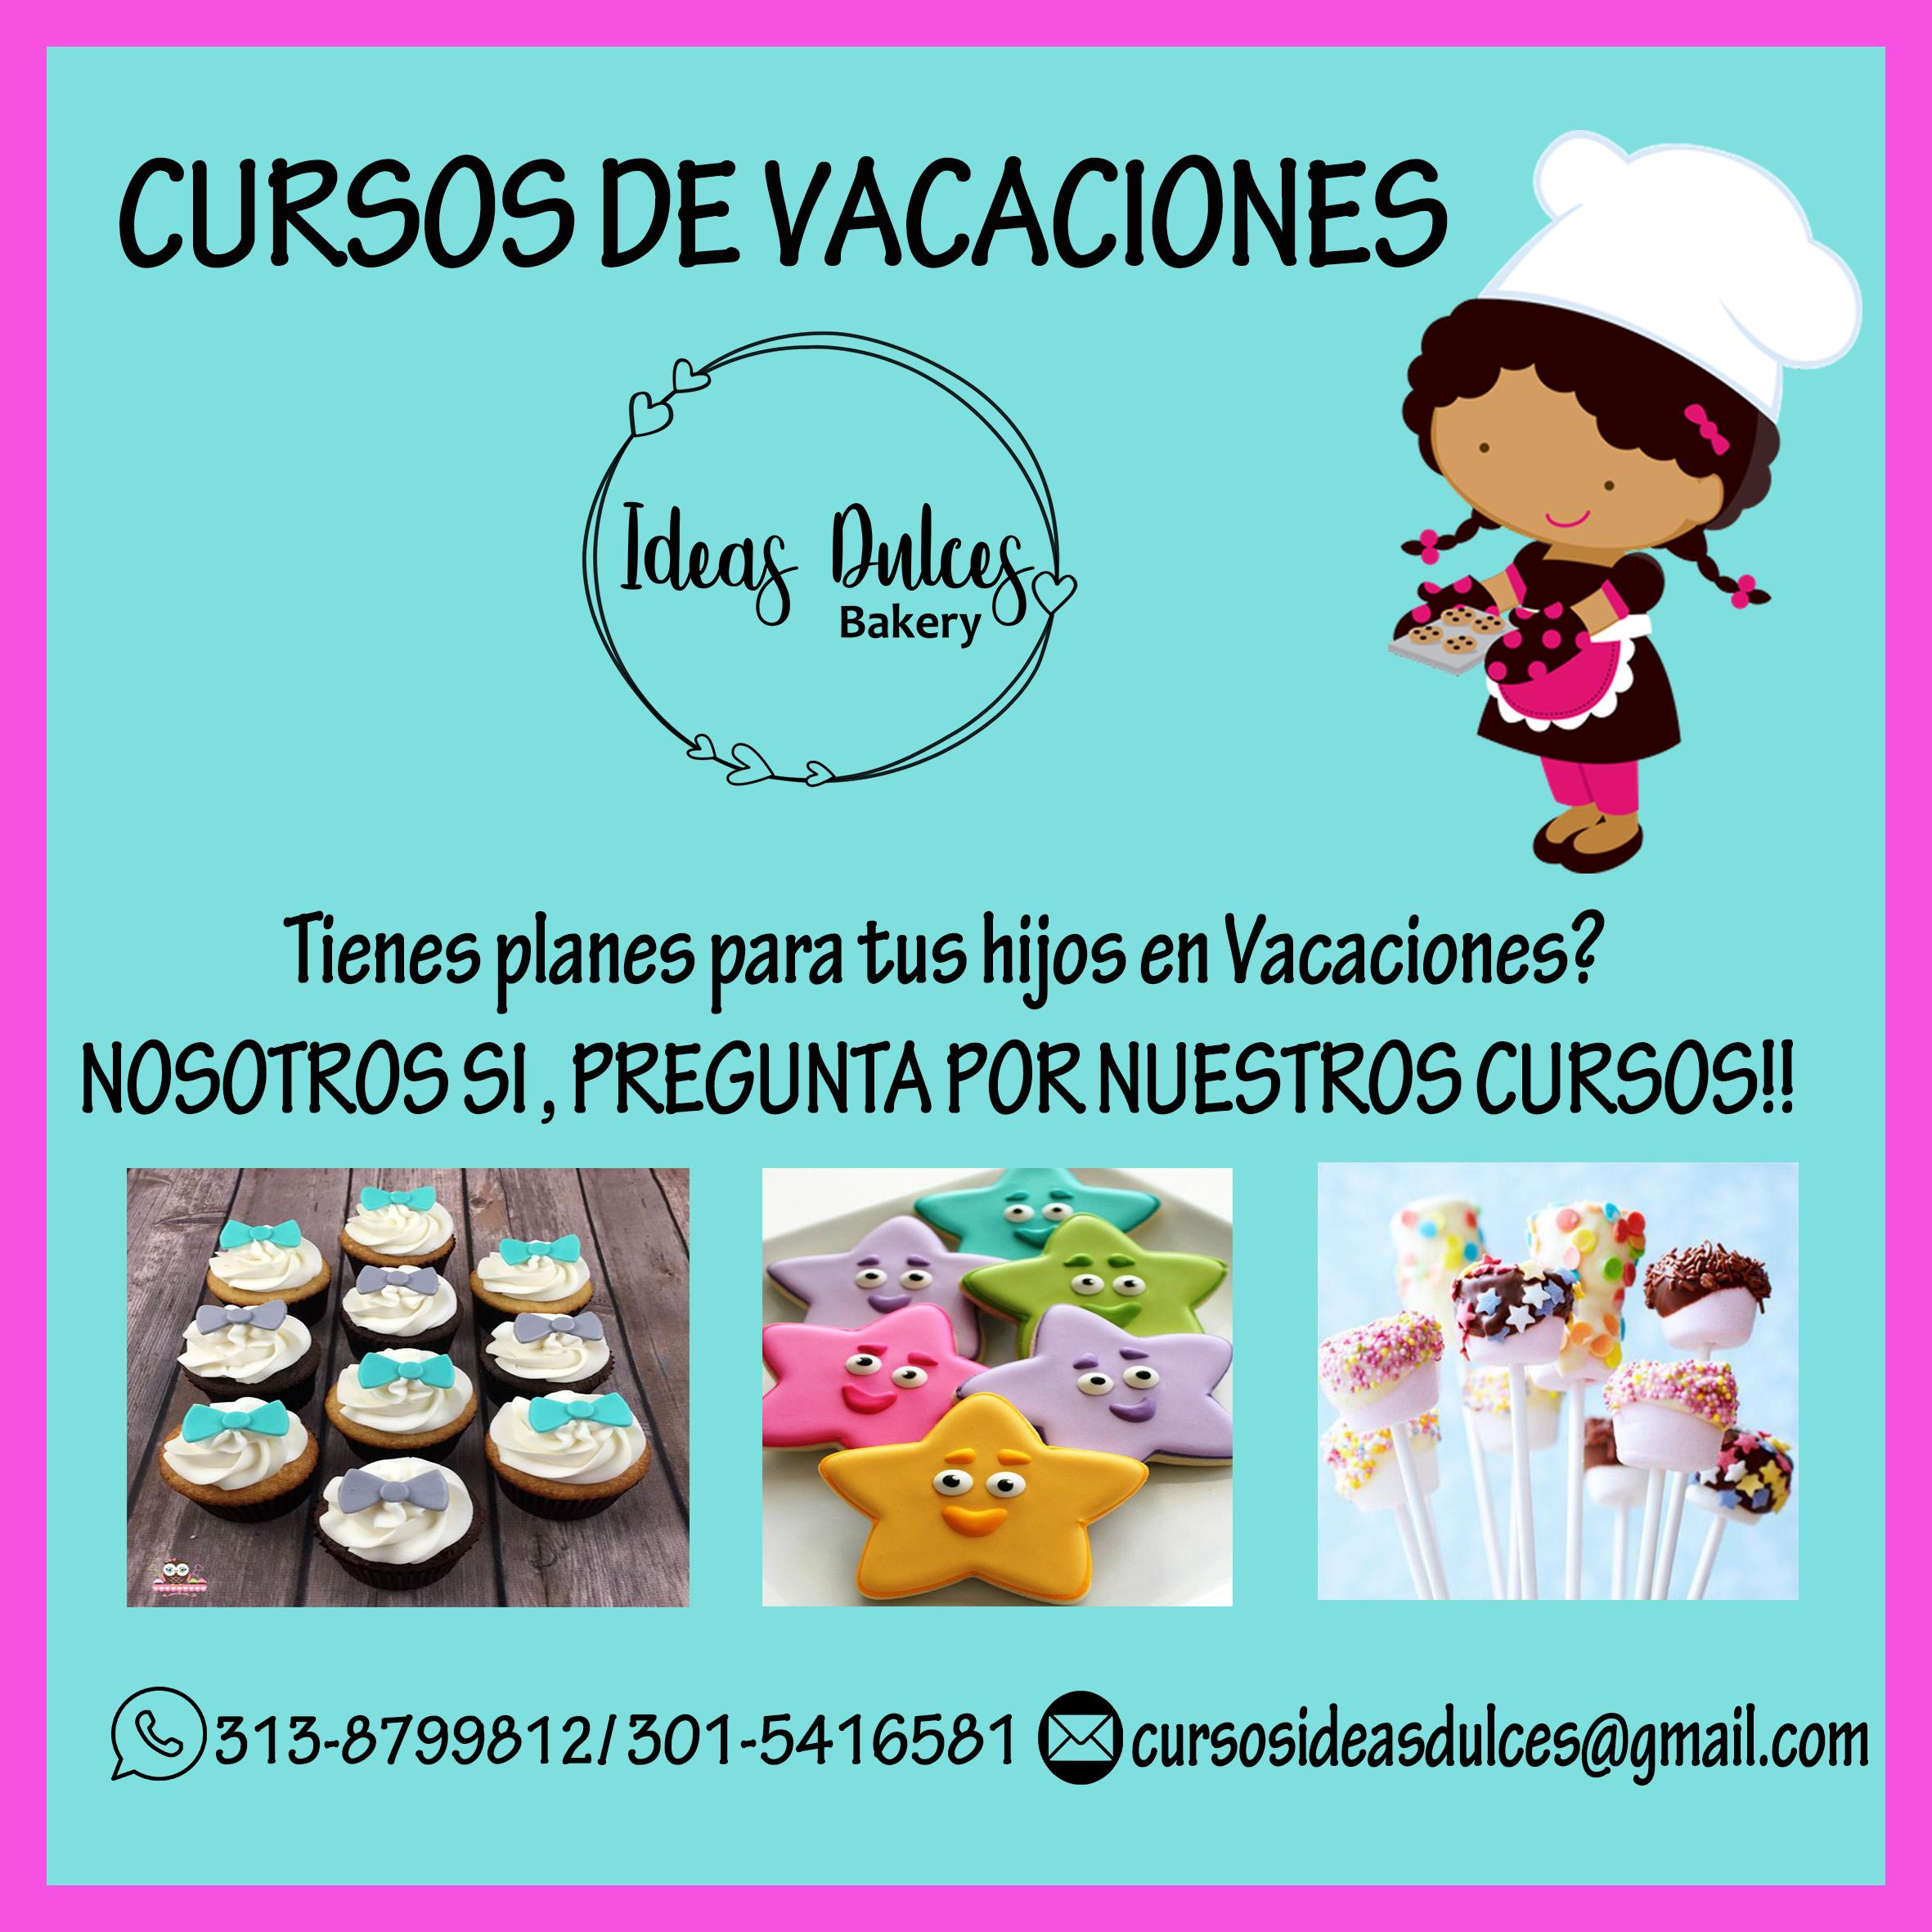 Ideas Dulces Bakery Repostería Artesanal Bogotá Colombia